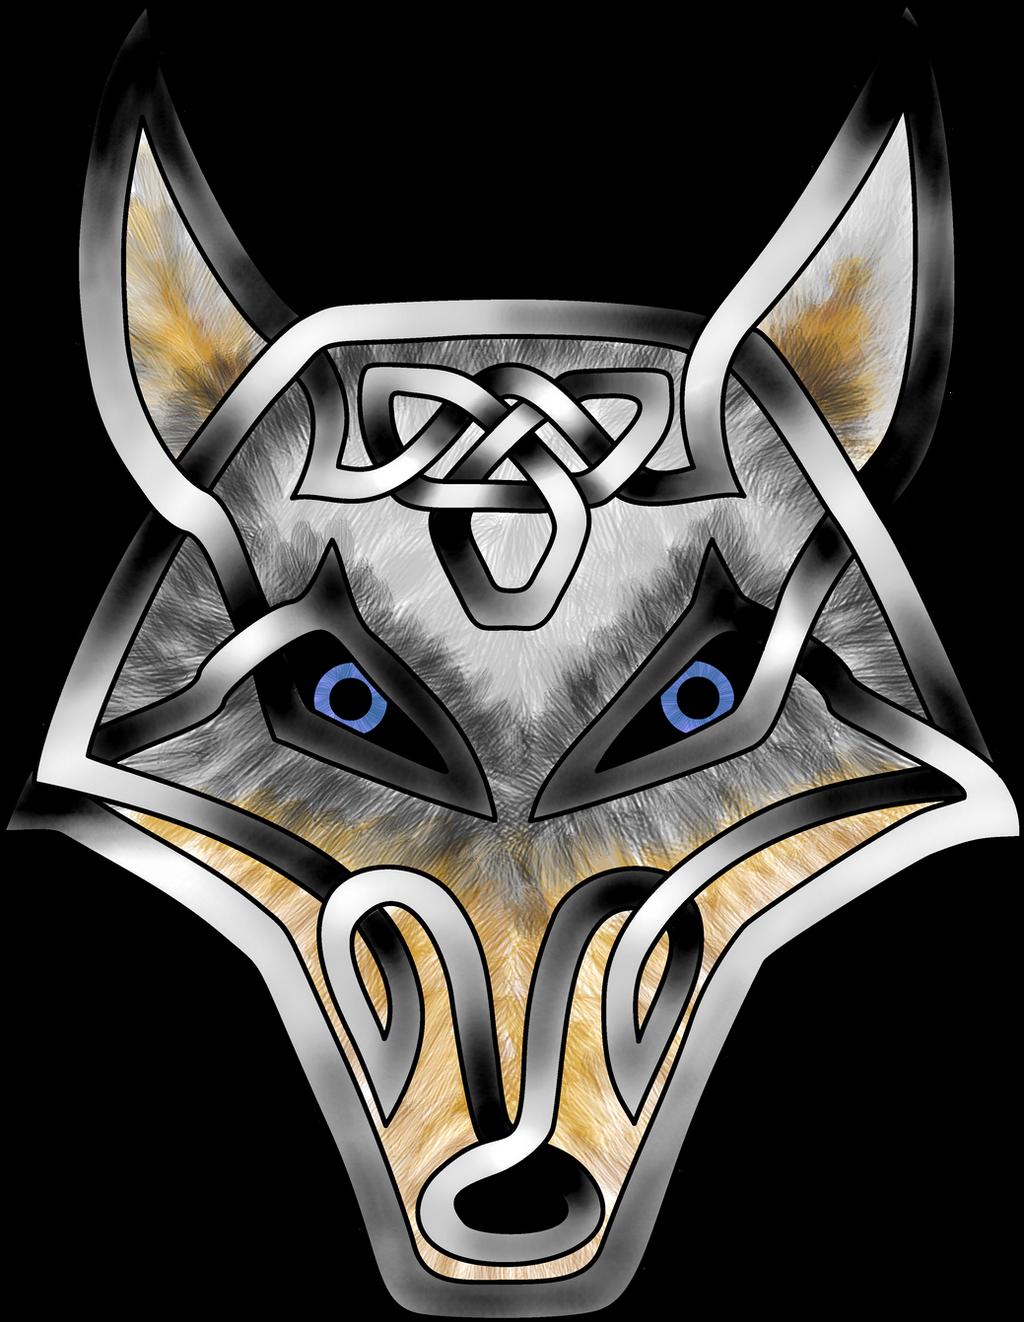 Celtic Knot Wolf Face By KnotYourWorld On DeviantArt